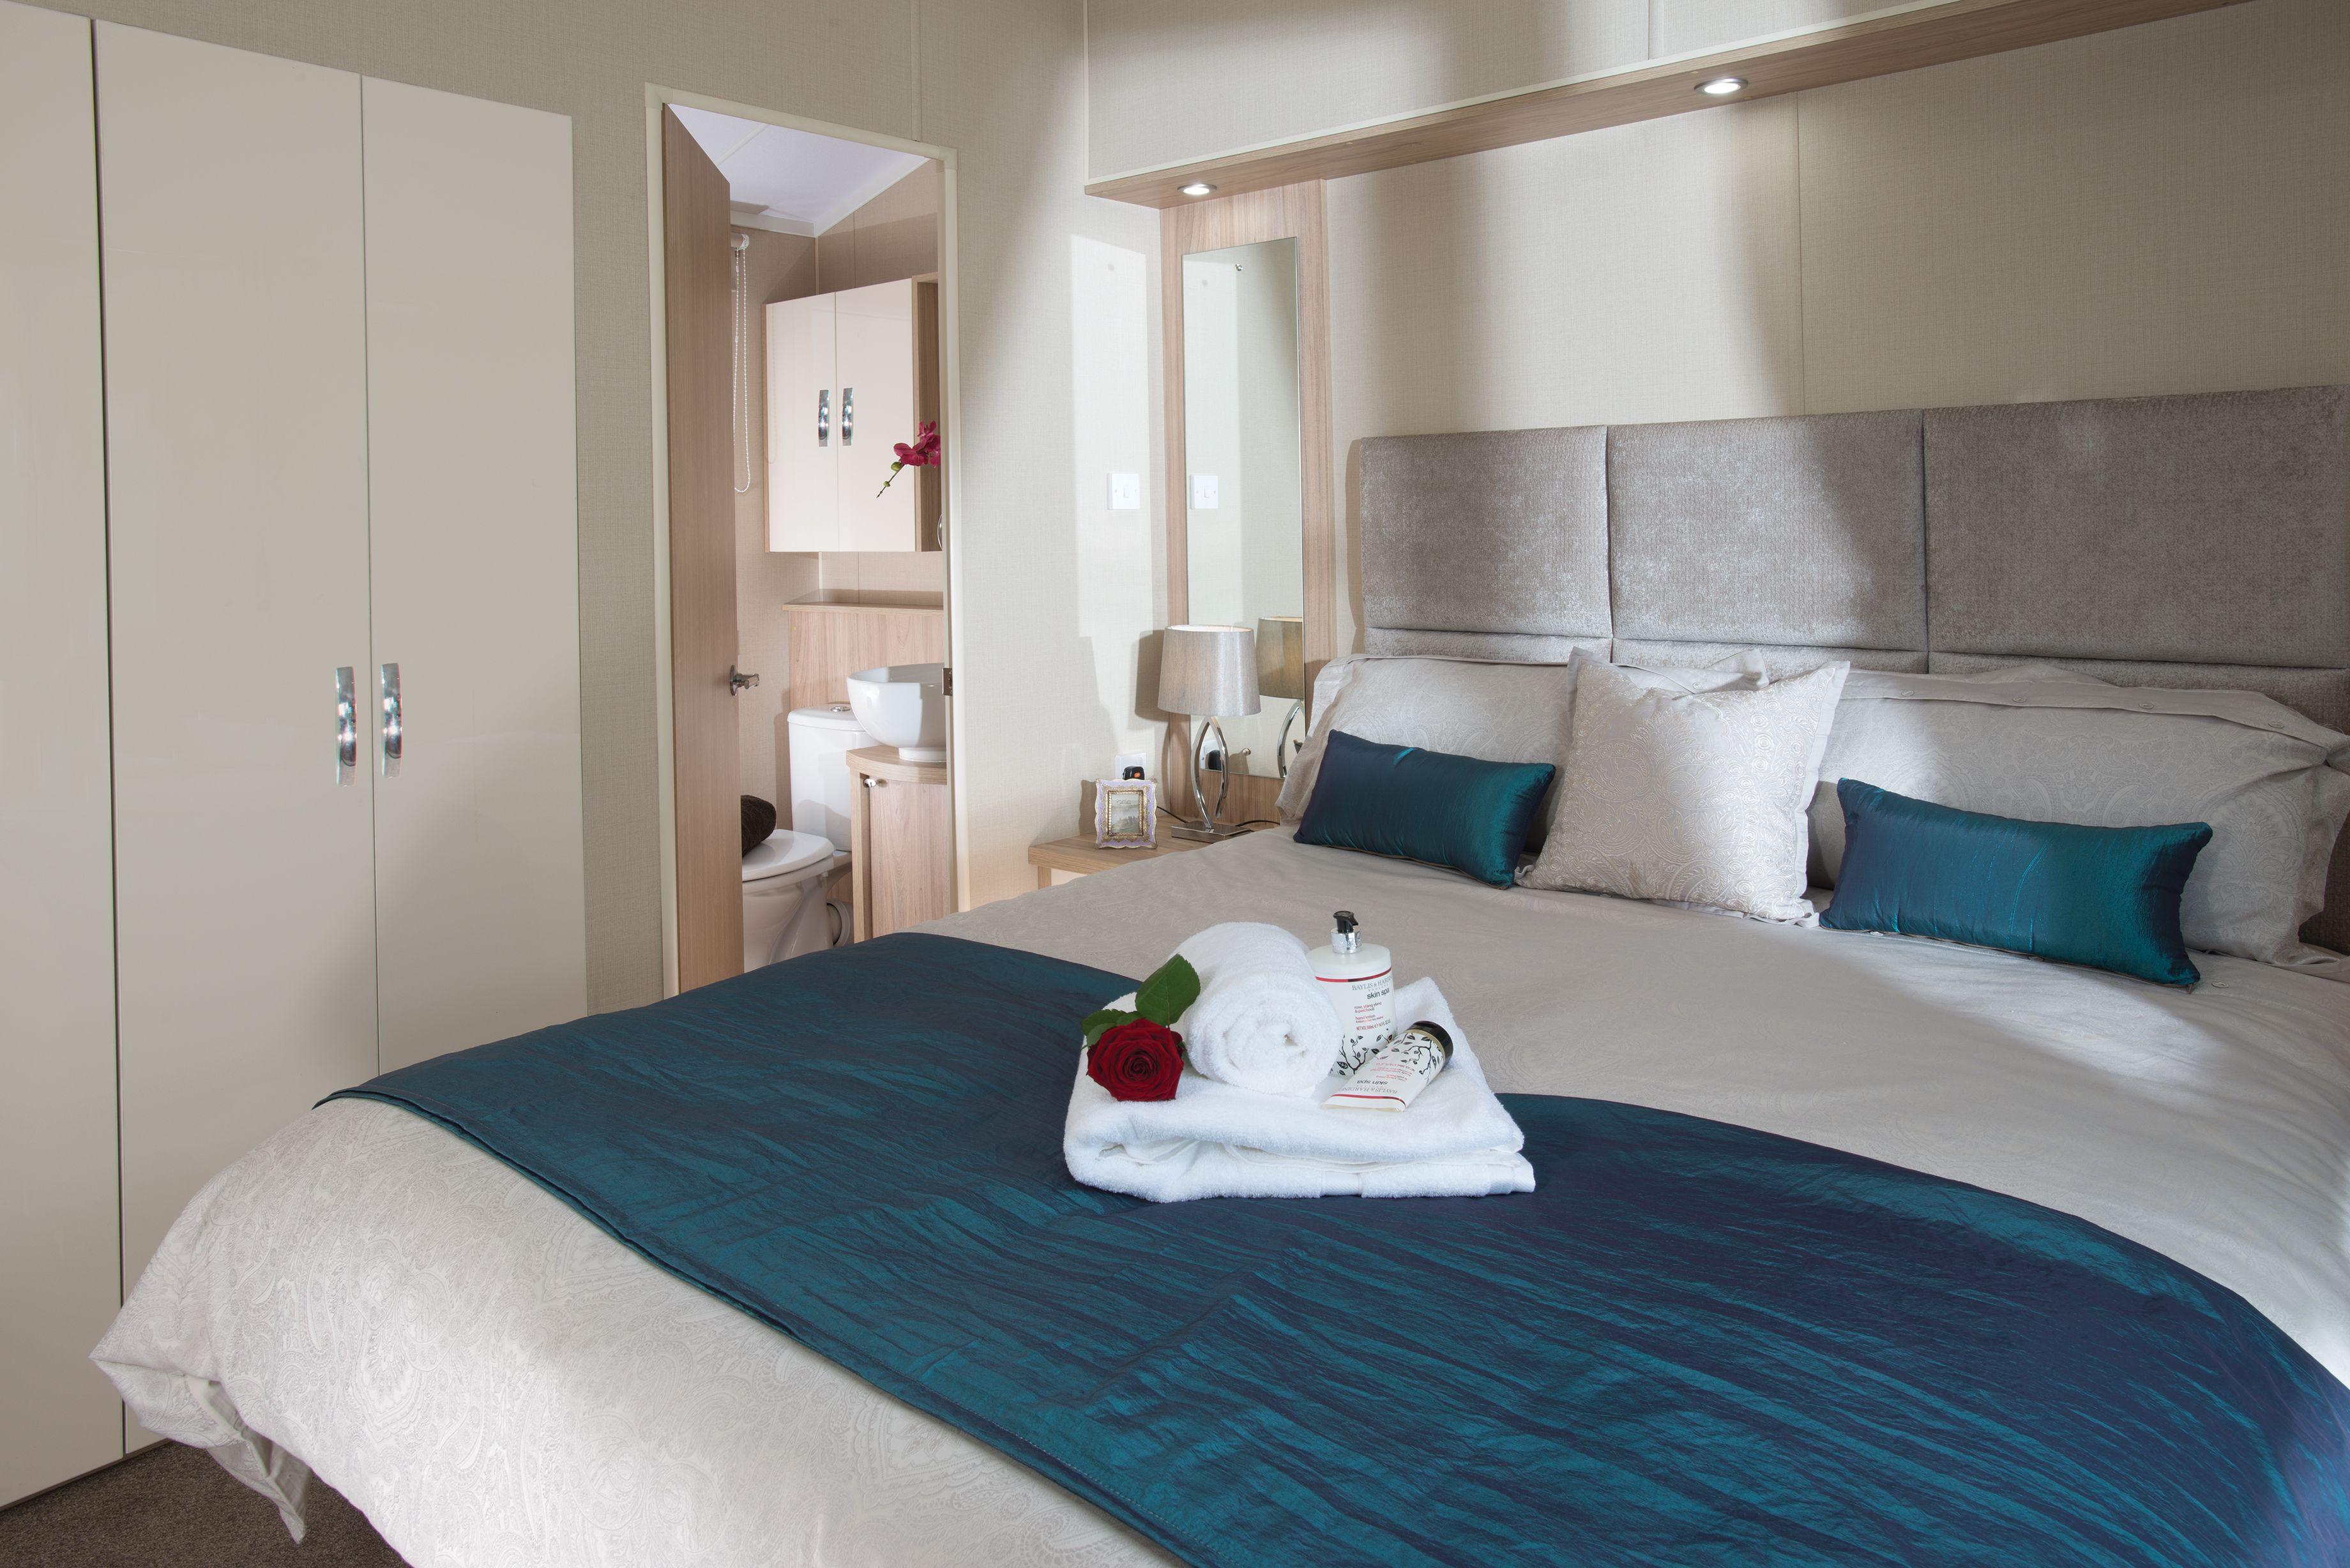 Best Regal Autograph Main Bedroom Ensuite Caravan Holiday 400 x 300